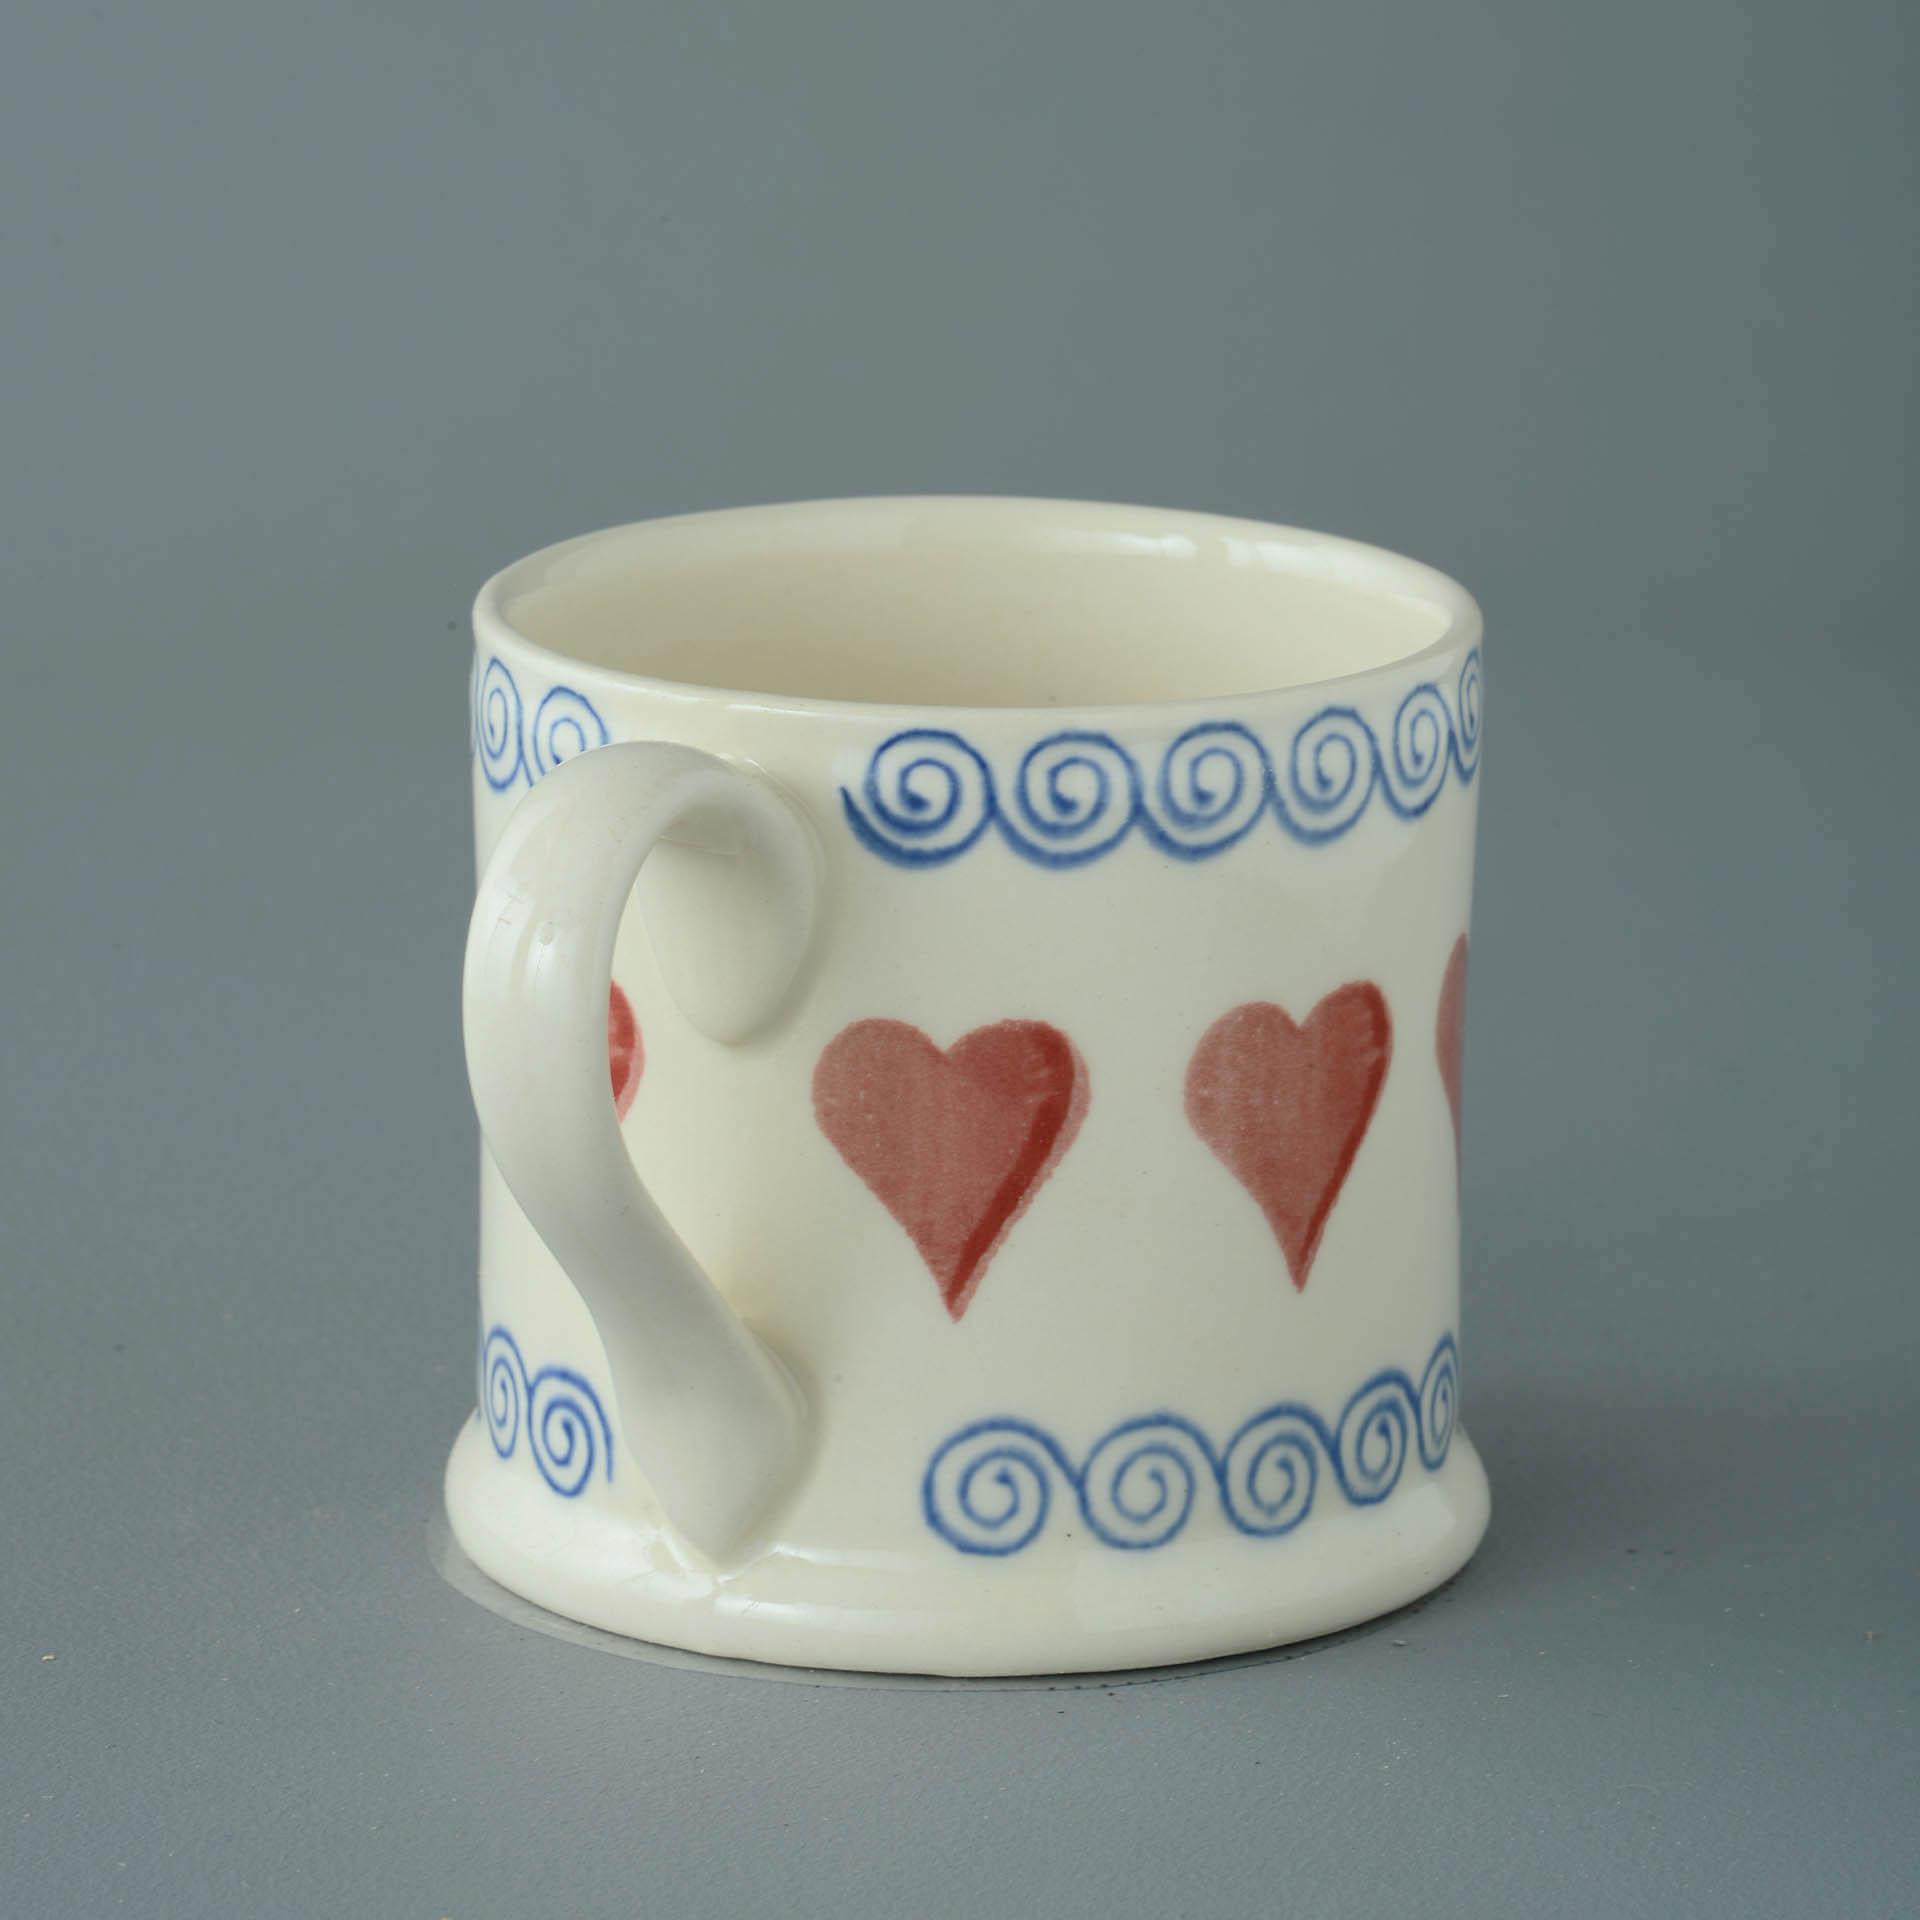 Hearts 250ml Large Mug 8 x 8.4cm